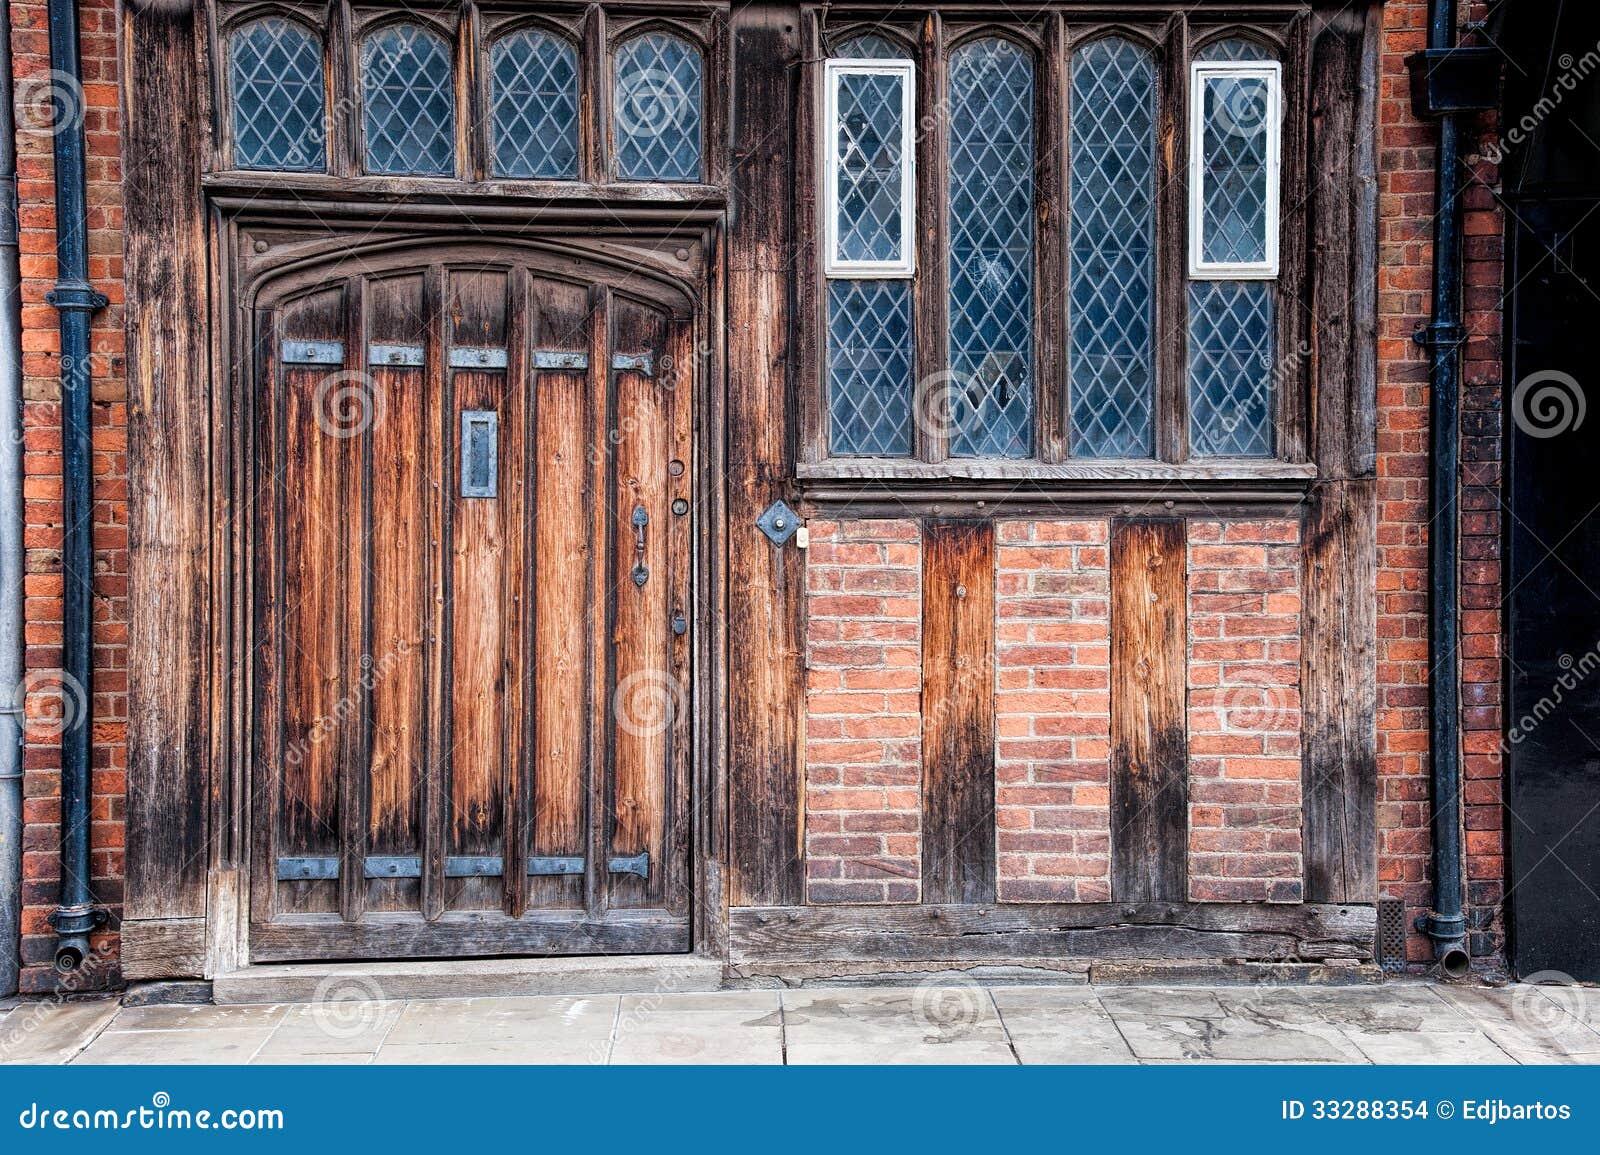 Tudor Windows tudor windows stock photo - image: 45530408